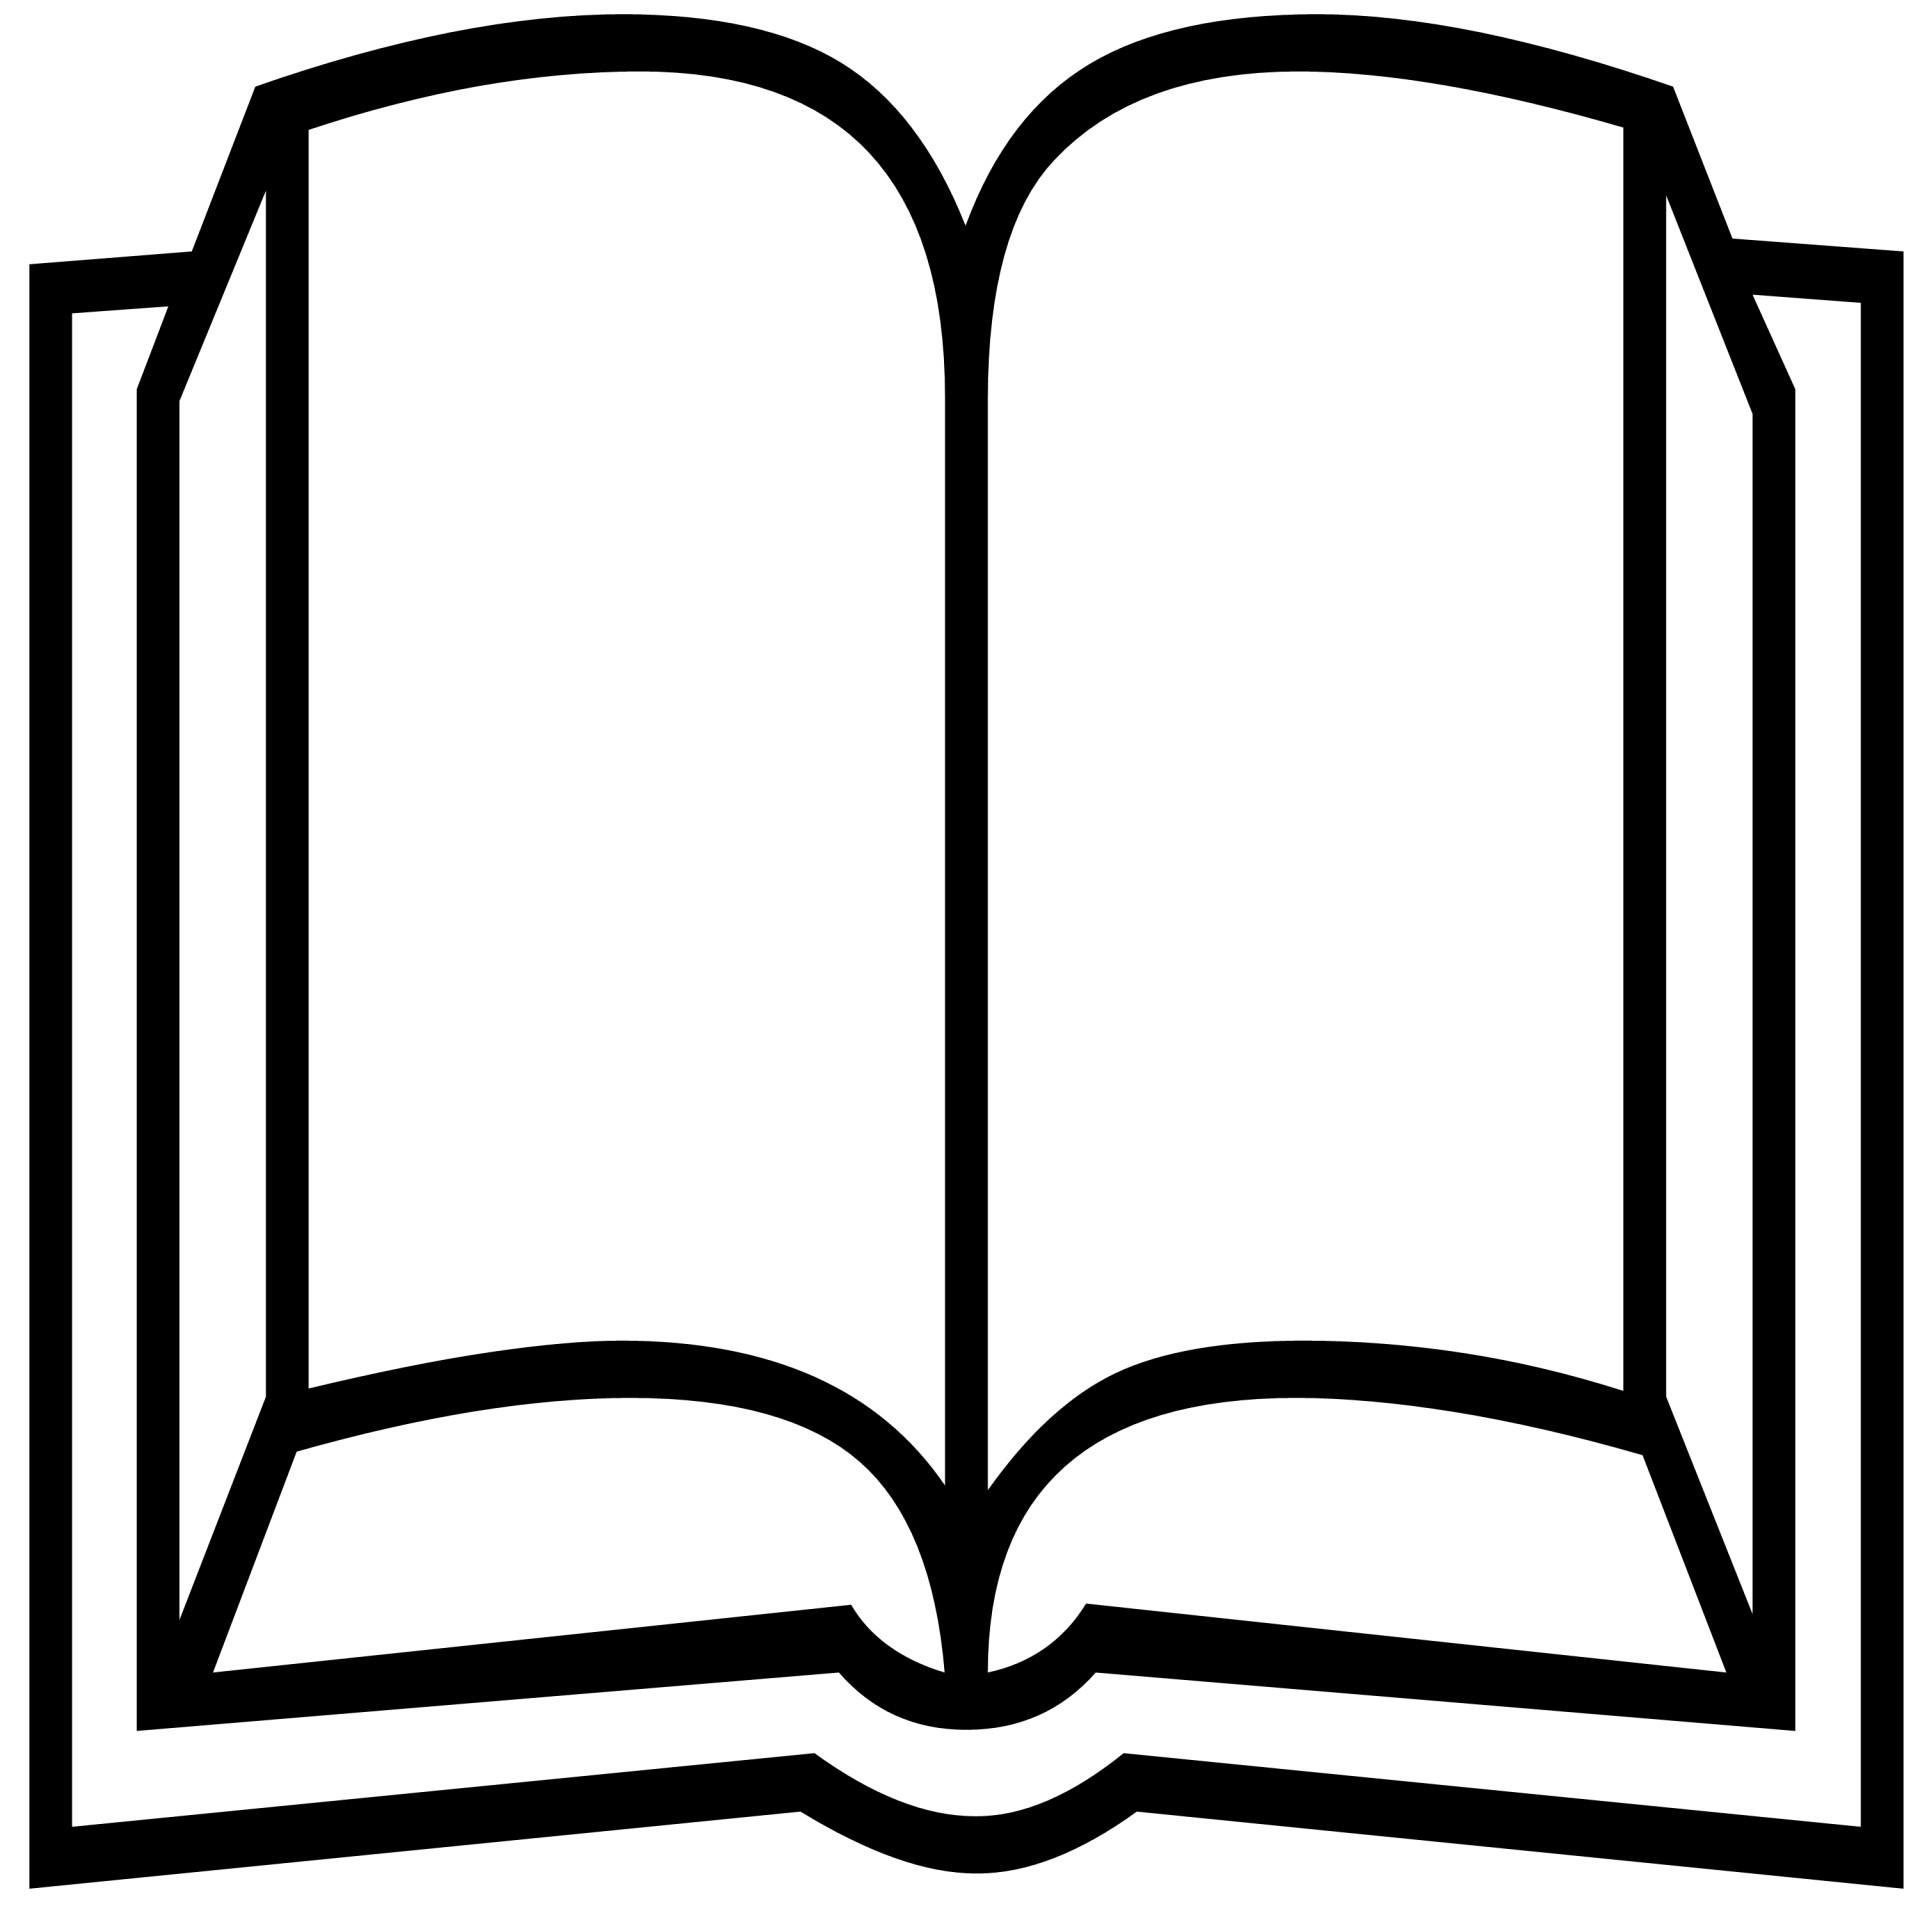 1920x1920 Open Book Silhouette Free Stock Photo